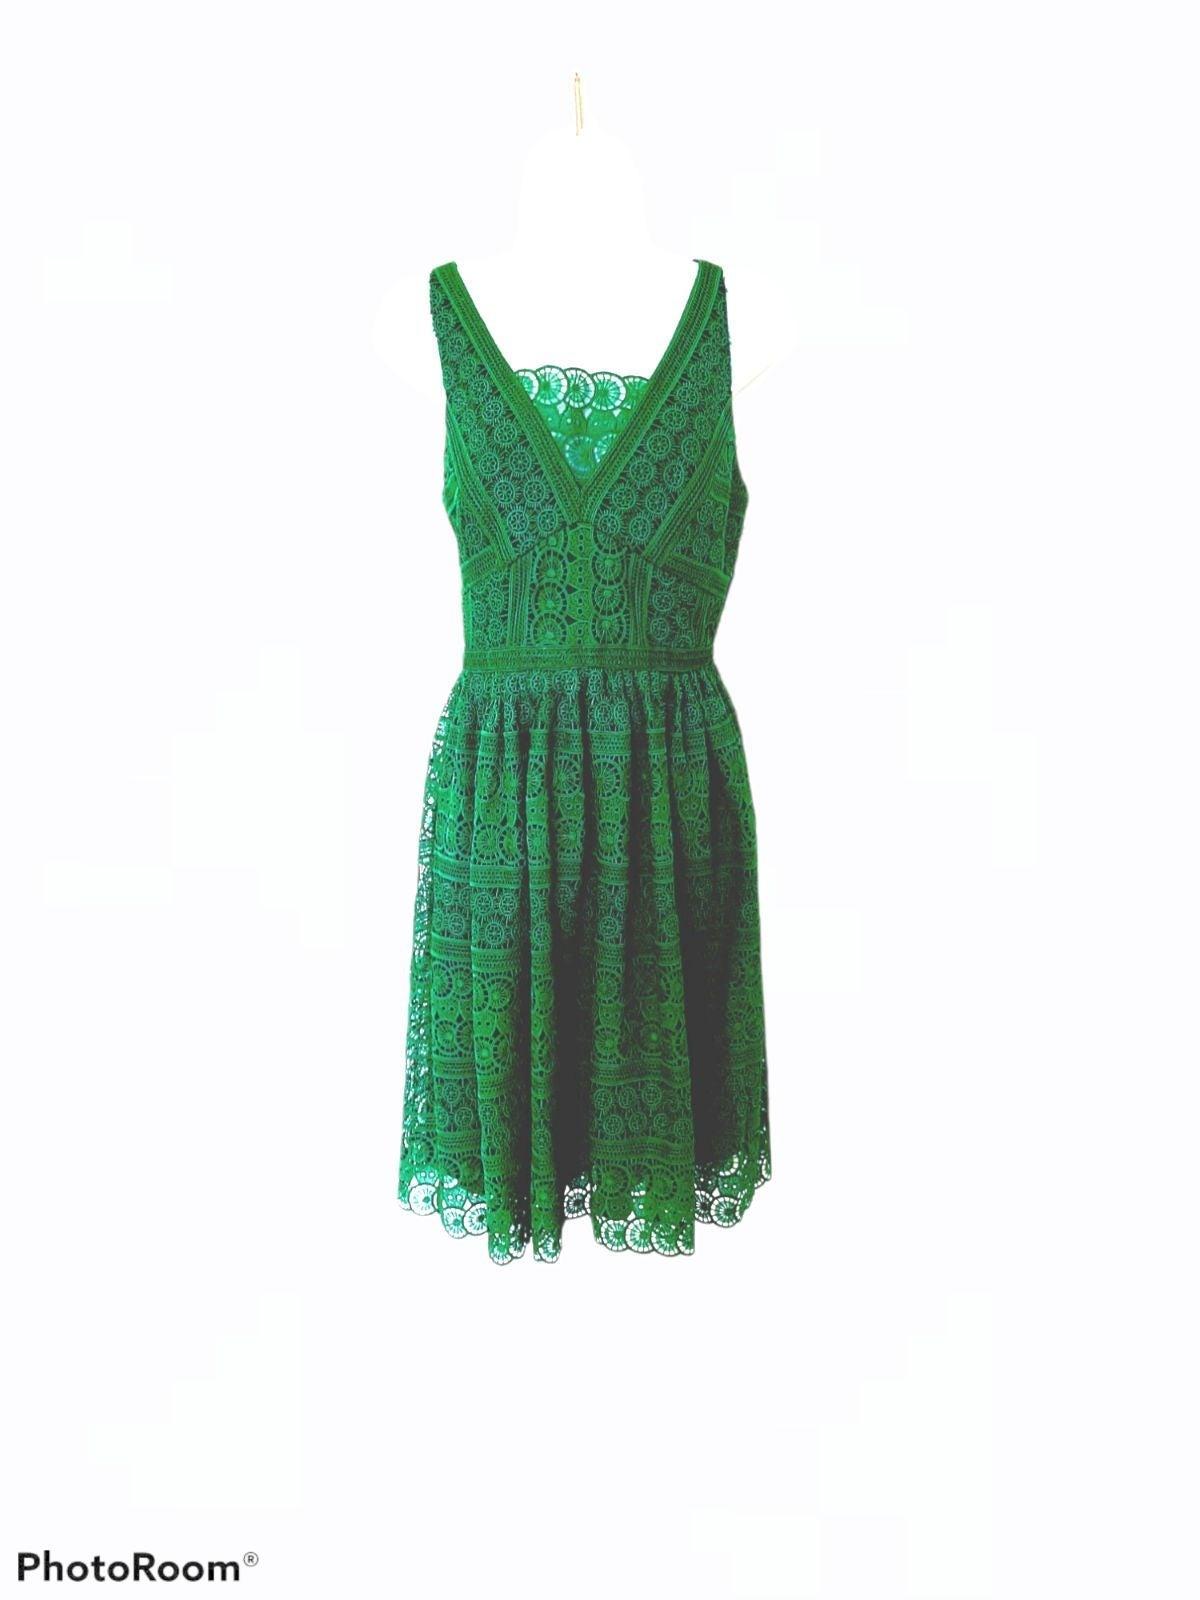 ANTONIO MELANIE GREEN CROCHET DRESS 2